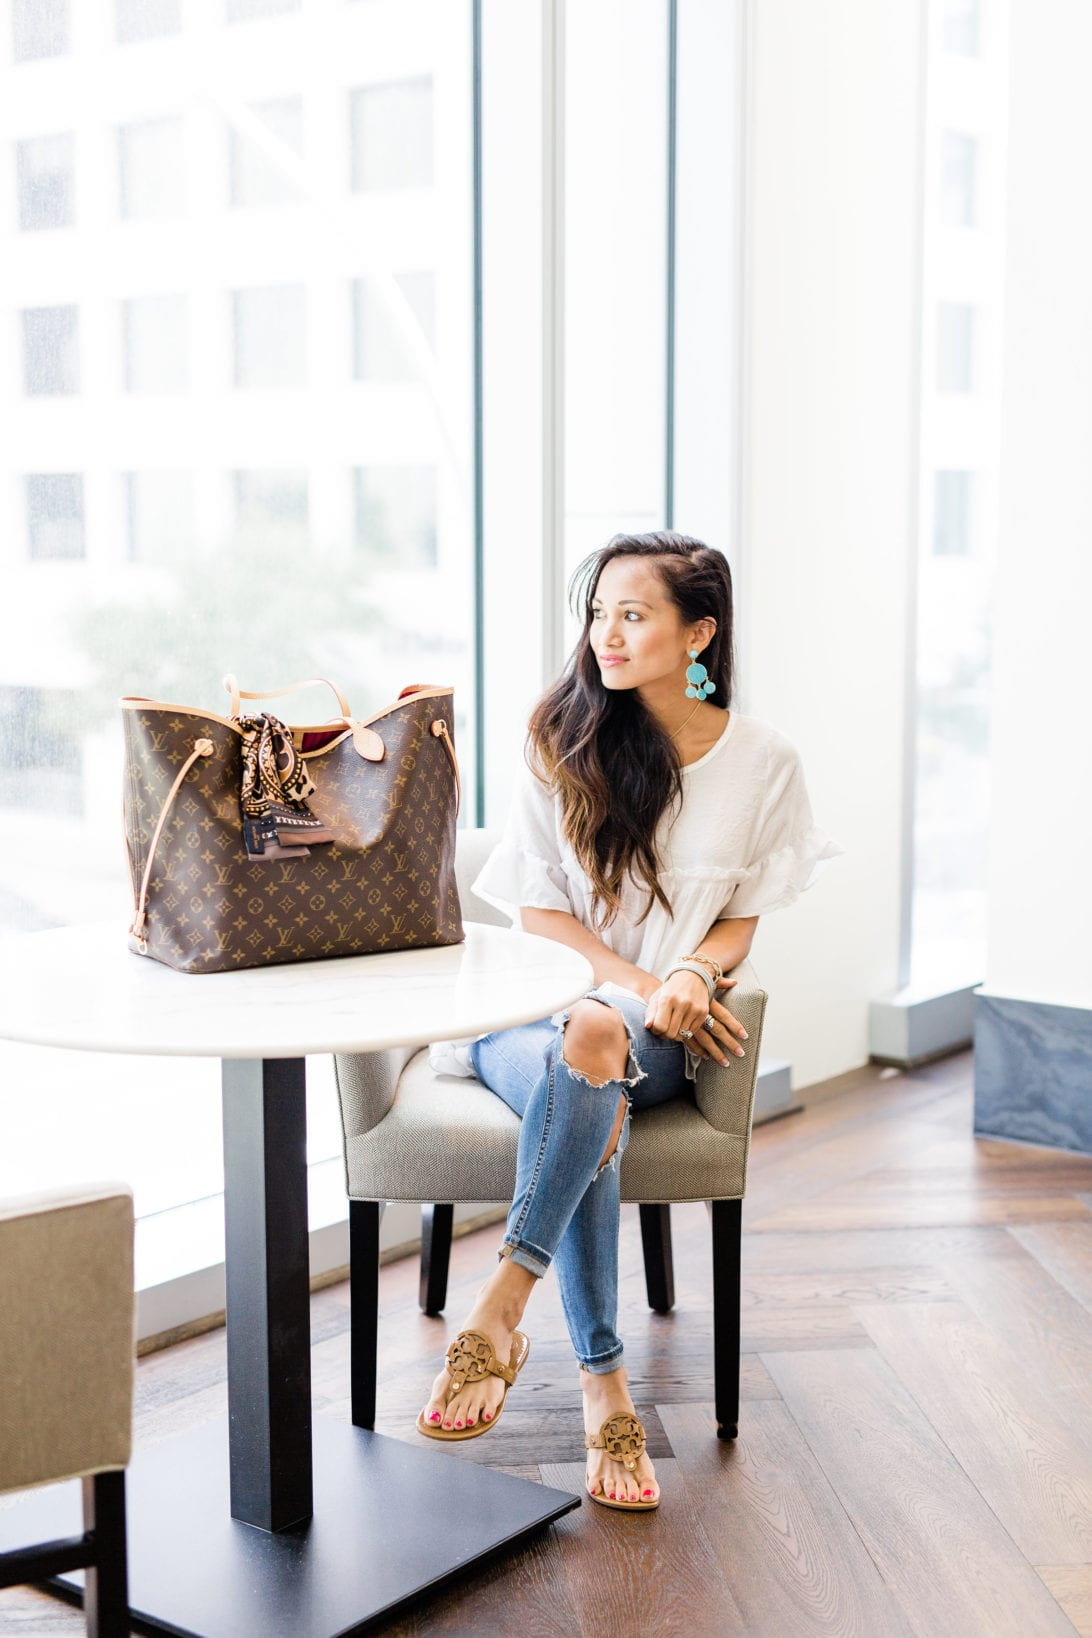 Louis Vuitton Monogrammed bag, Neverfull Gm, World Tour, #LVWORLD, #LOUISVUITTON, Louis Vuitton World Tour Bandeau, Bandeau, #summerstyle, #summerfashion, black bikini, date night look, Tory Burch Miller Sandals